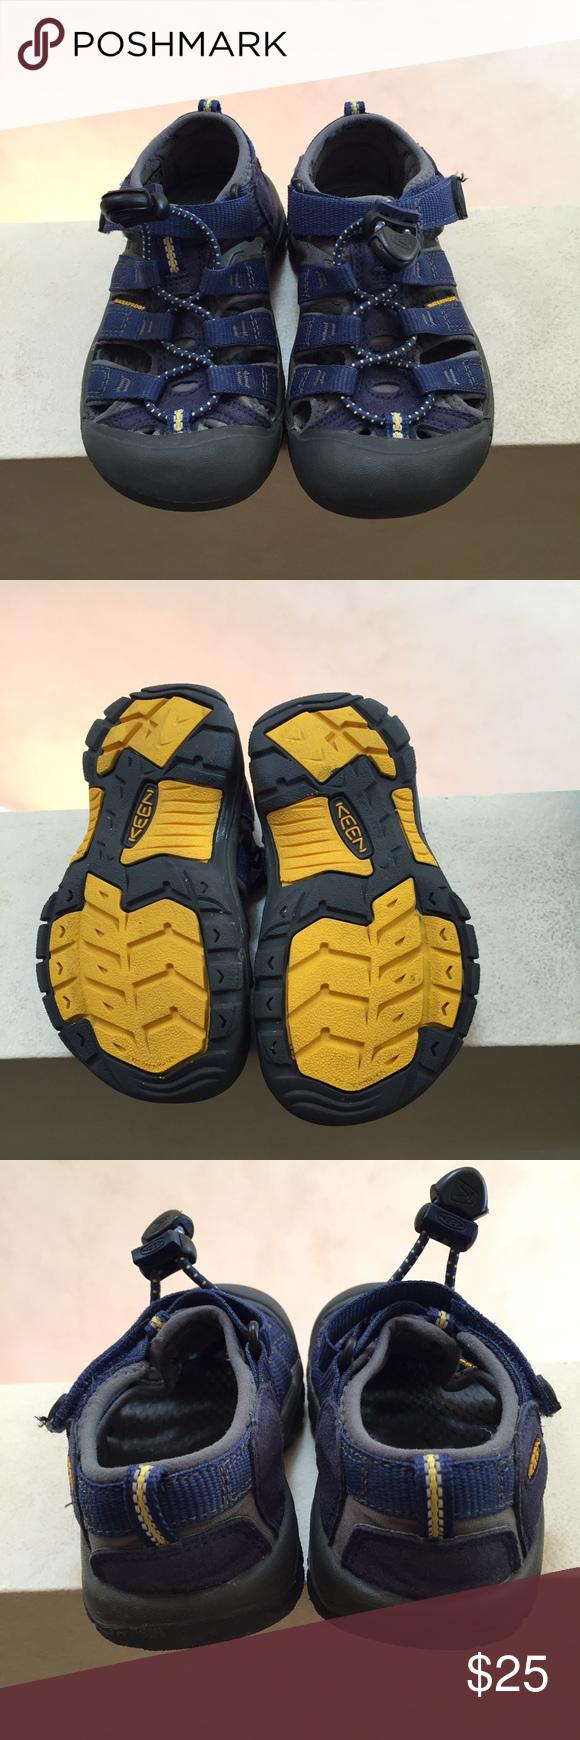 Keen waterproof sandals - toddler size 10 Keen waterproof sandals in perfect condition. Toddler size 10. Keen Shoes Sandals & Flip Flops